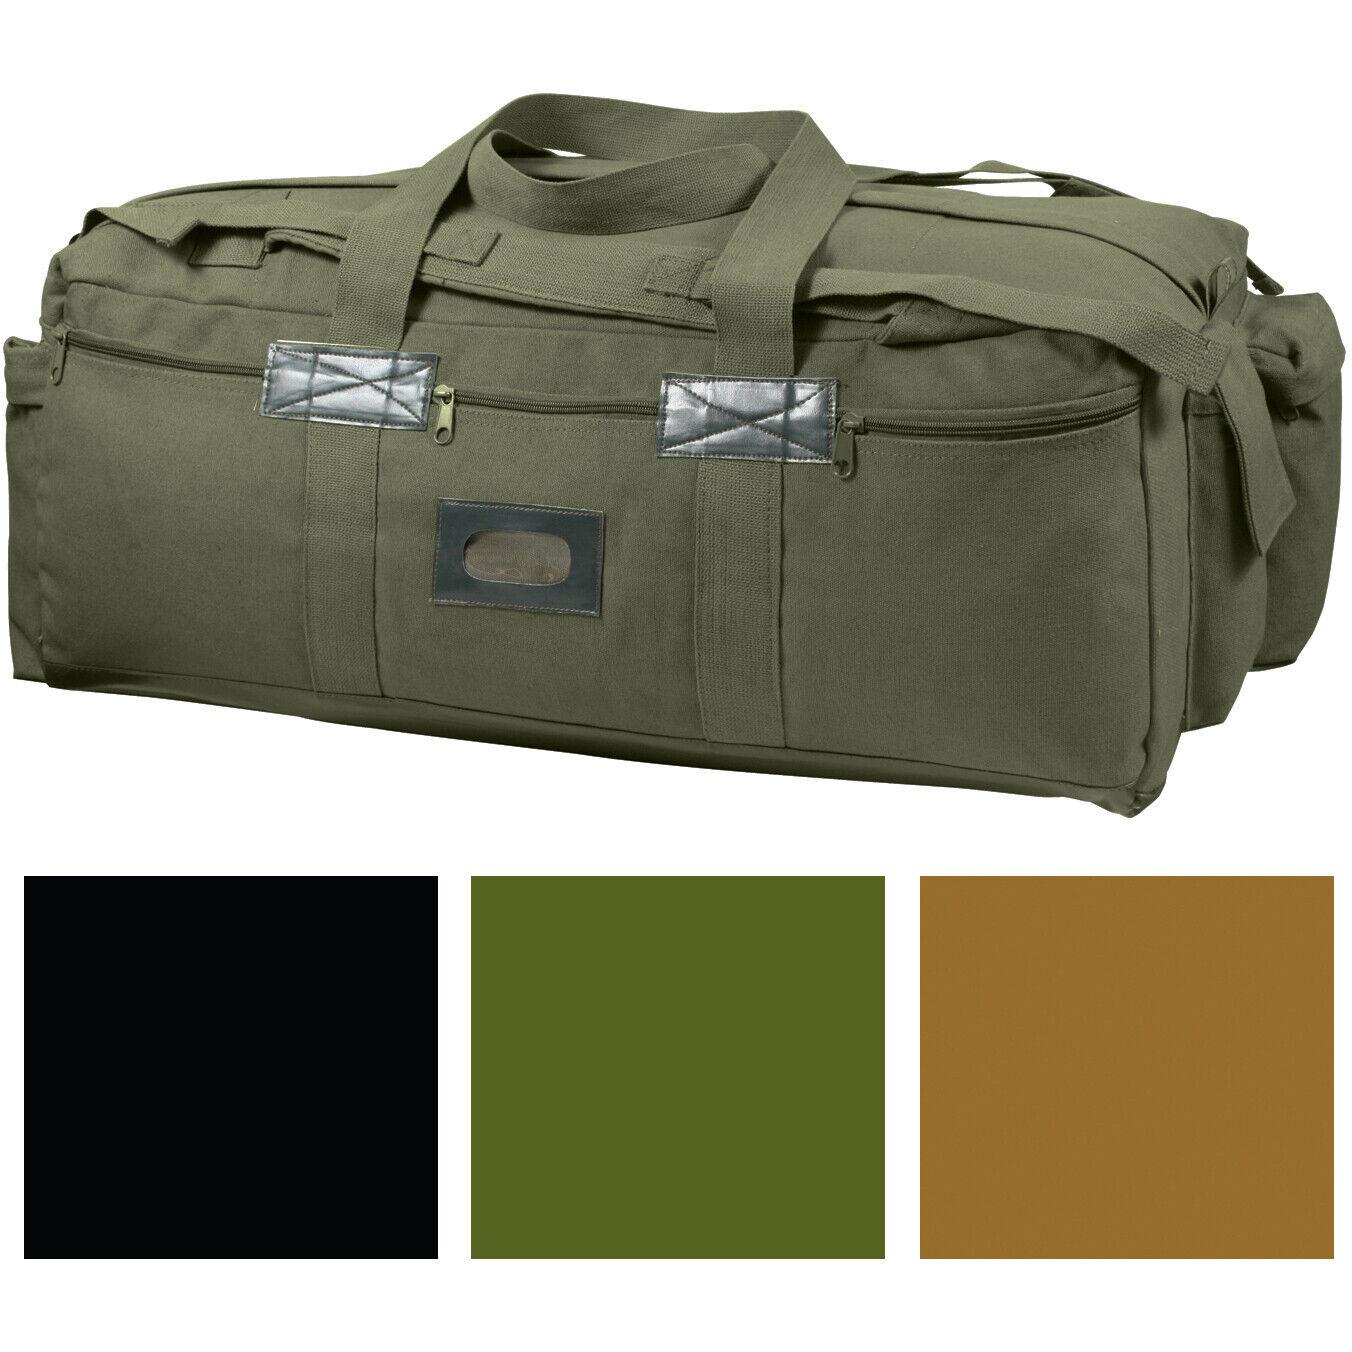 Heavy Duty Cotton Canvas Tactical Duffle Bag Israeli Mossad